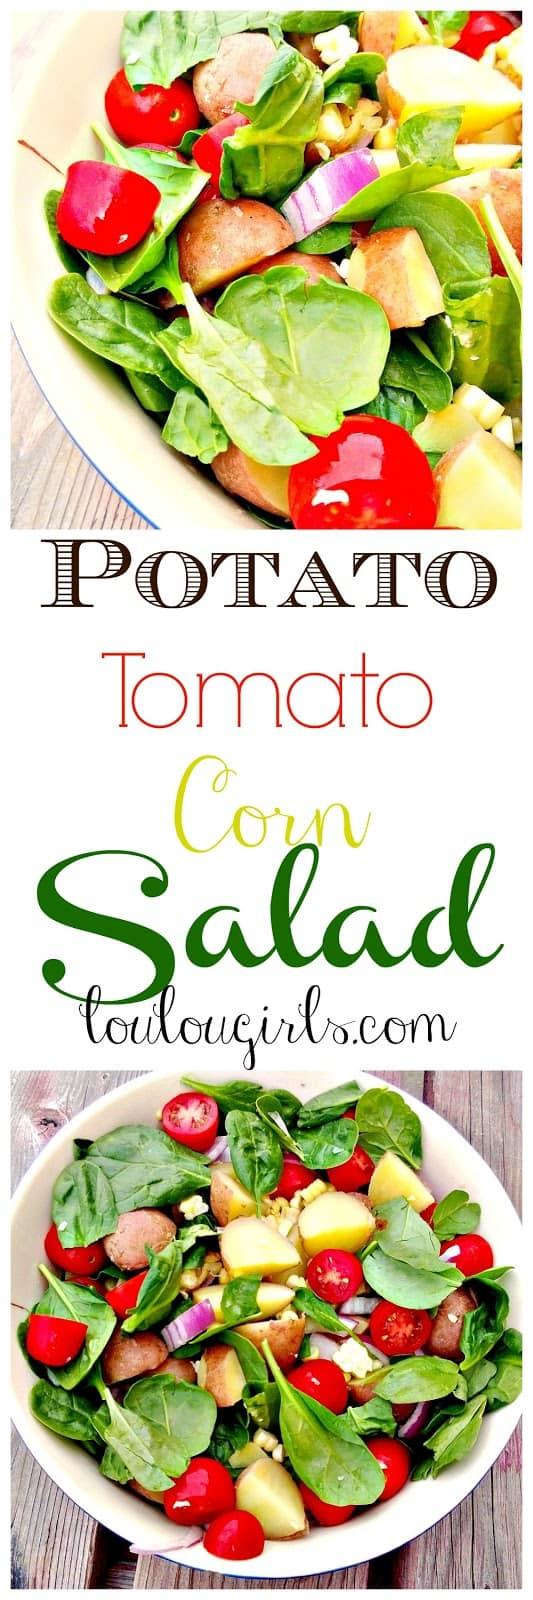 Potato Tomato Corn Salad from Lou Lou Girls